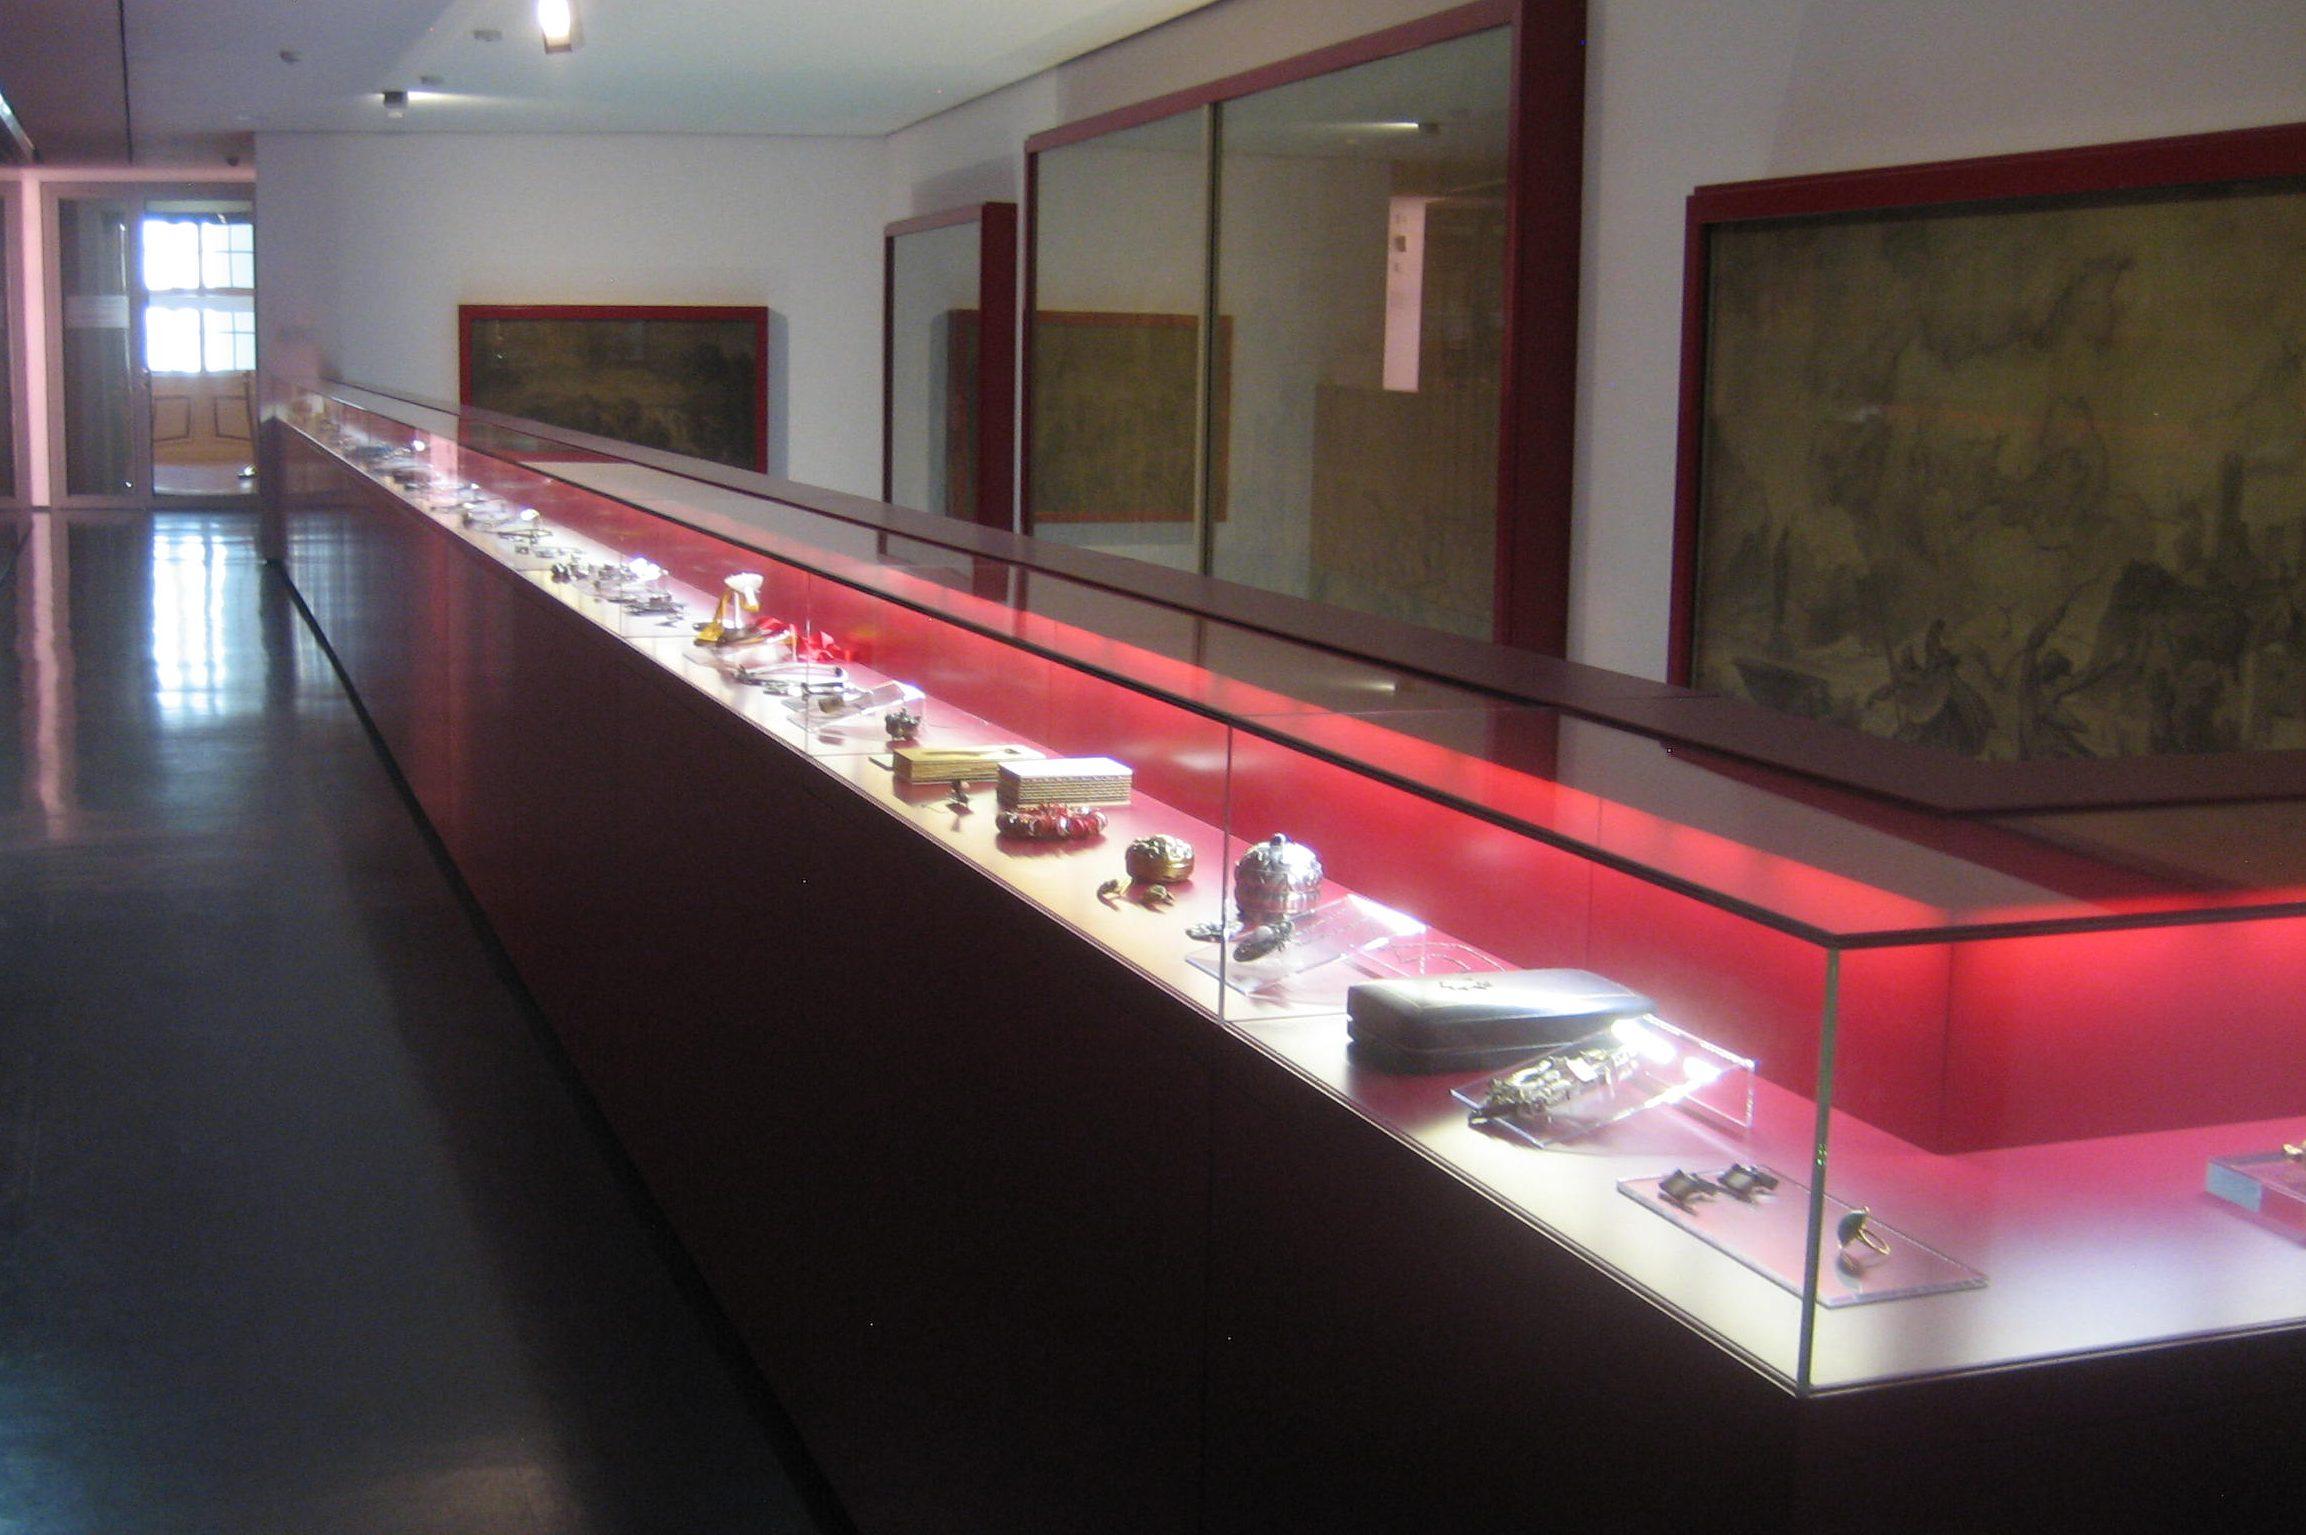 Angermuseum, opstelling sieraden. Foto Esther Doornbusch, mei 2018, CC BY 4.0